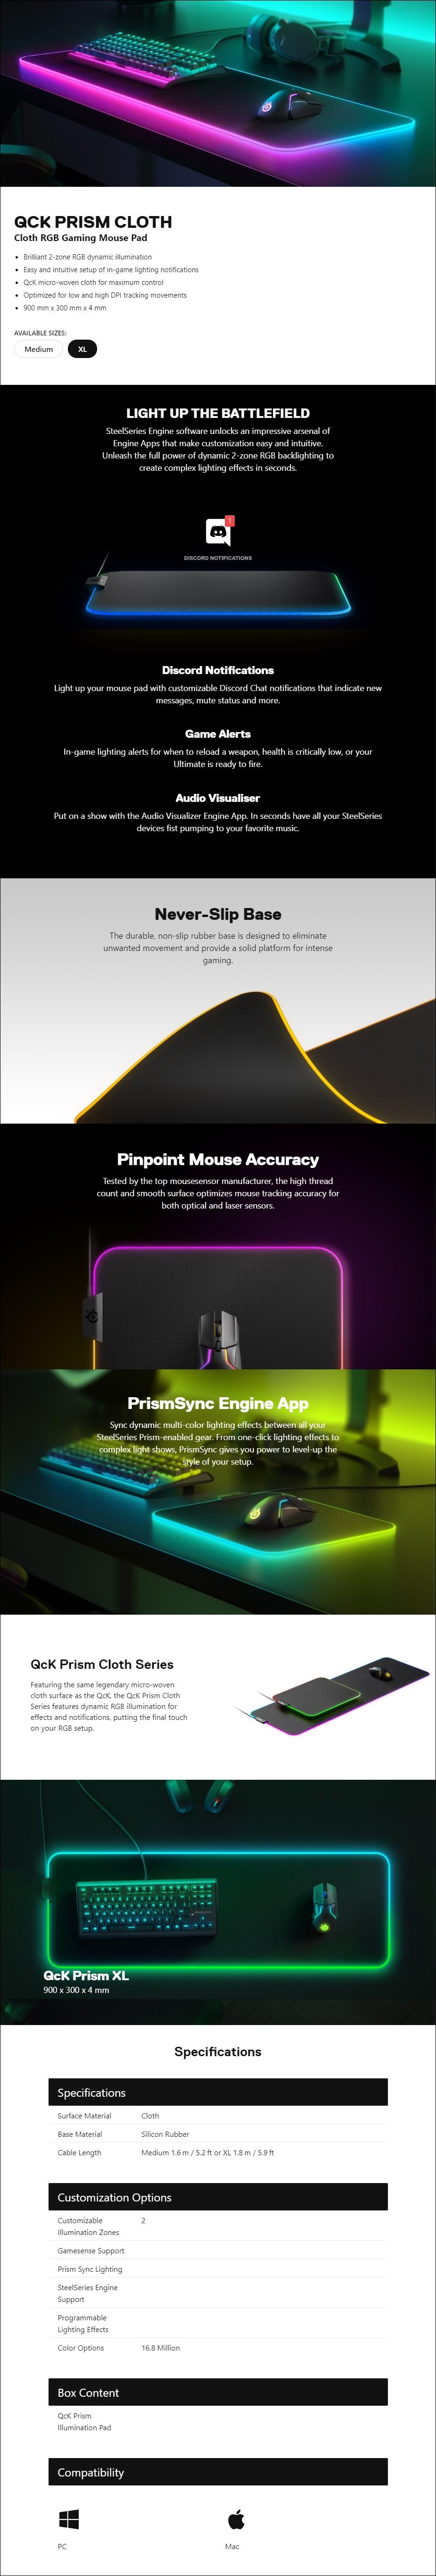 steelseries-qck-prism-cloth-rgb-gaming-mouse-pad-xl-ac27280-3.jpg